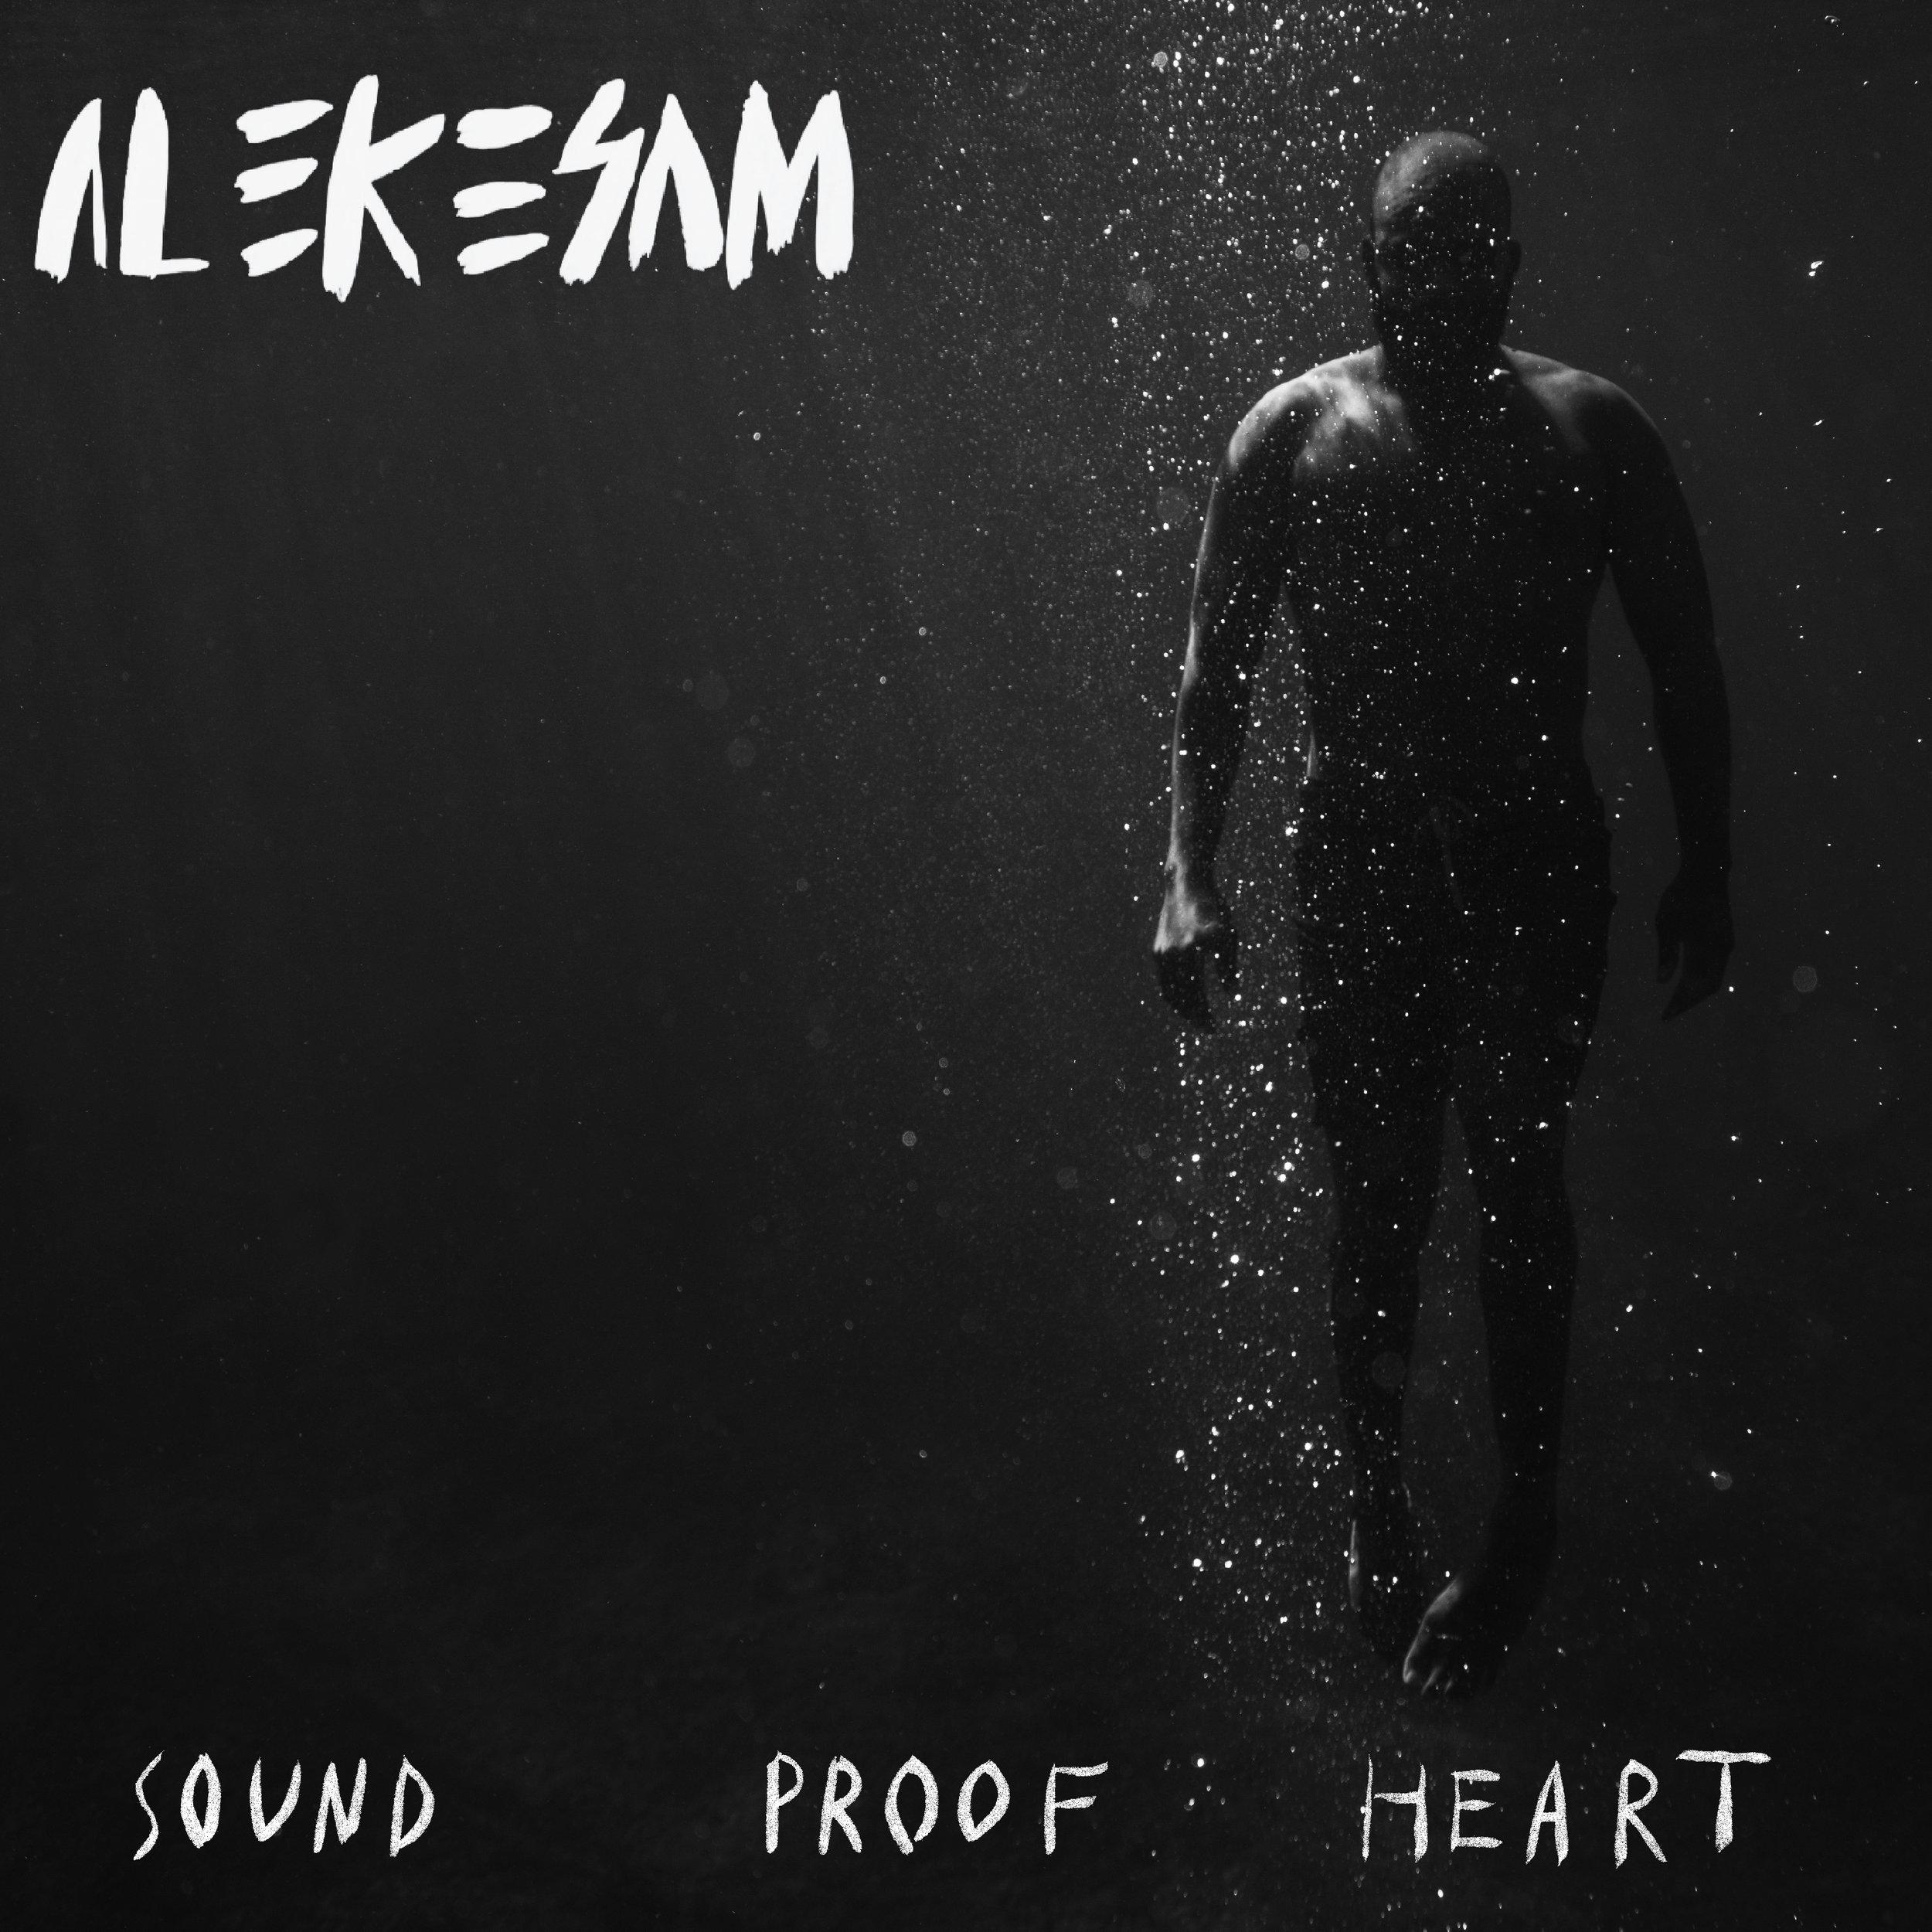 Alekesam_soundproofheart.jpg